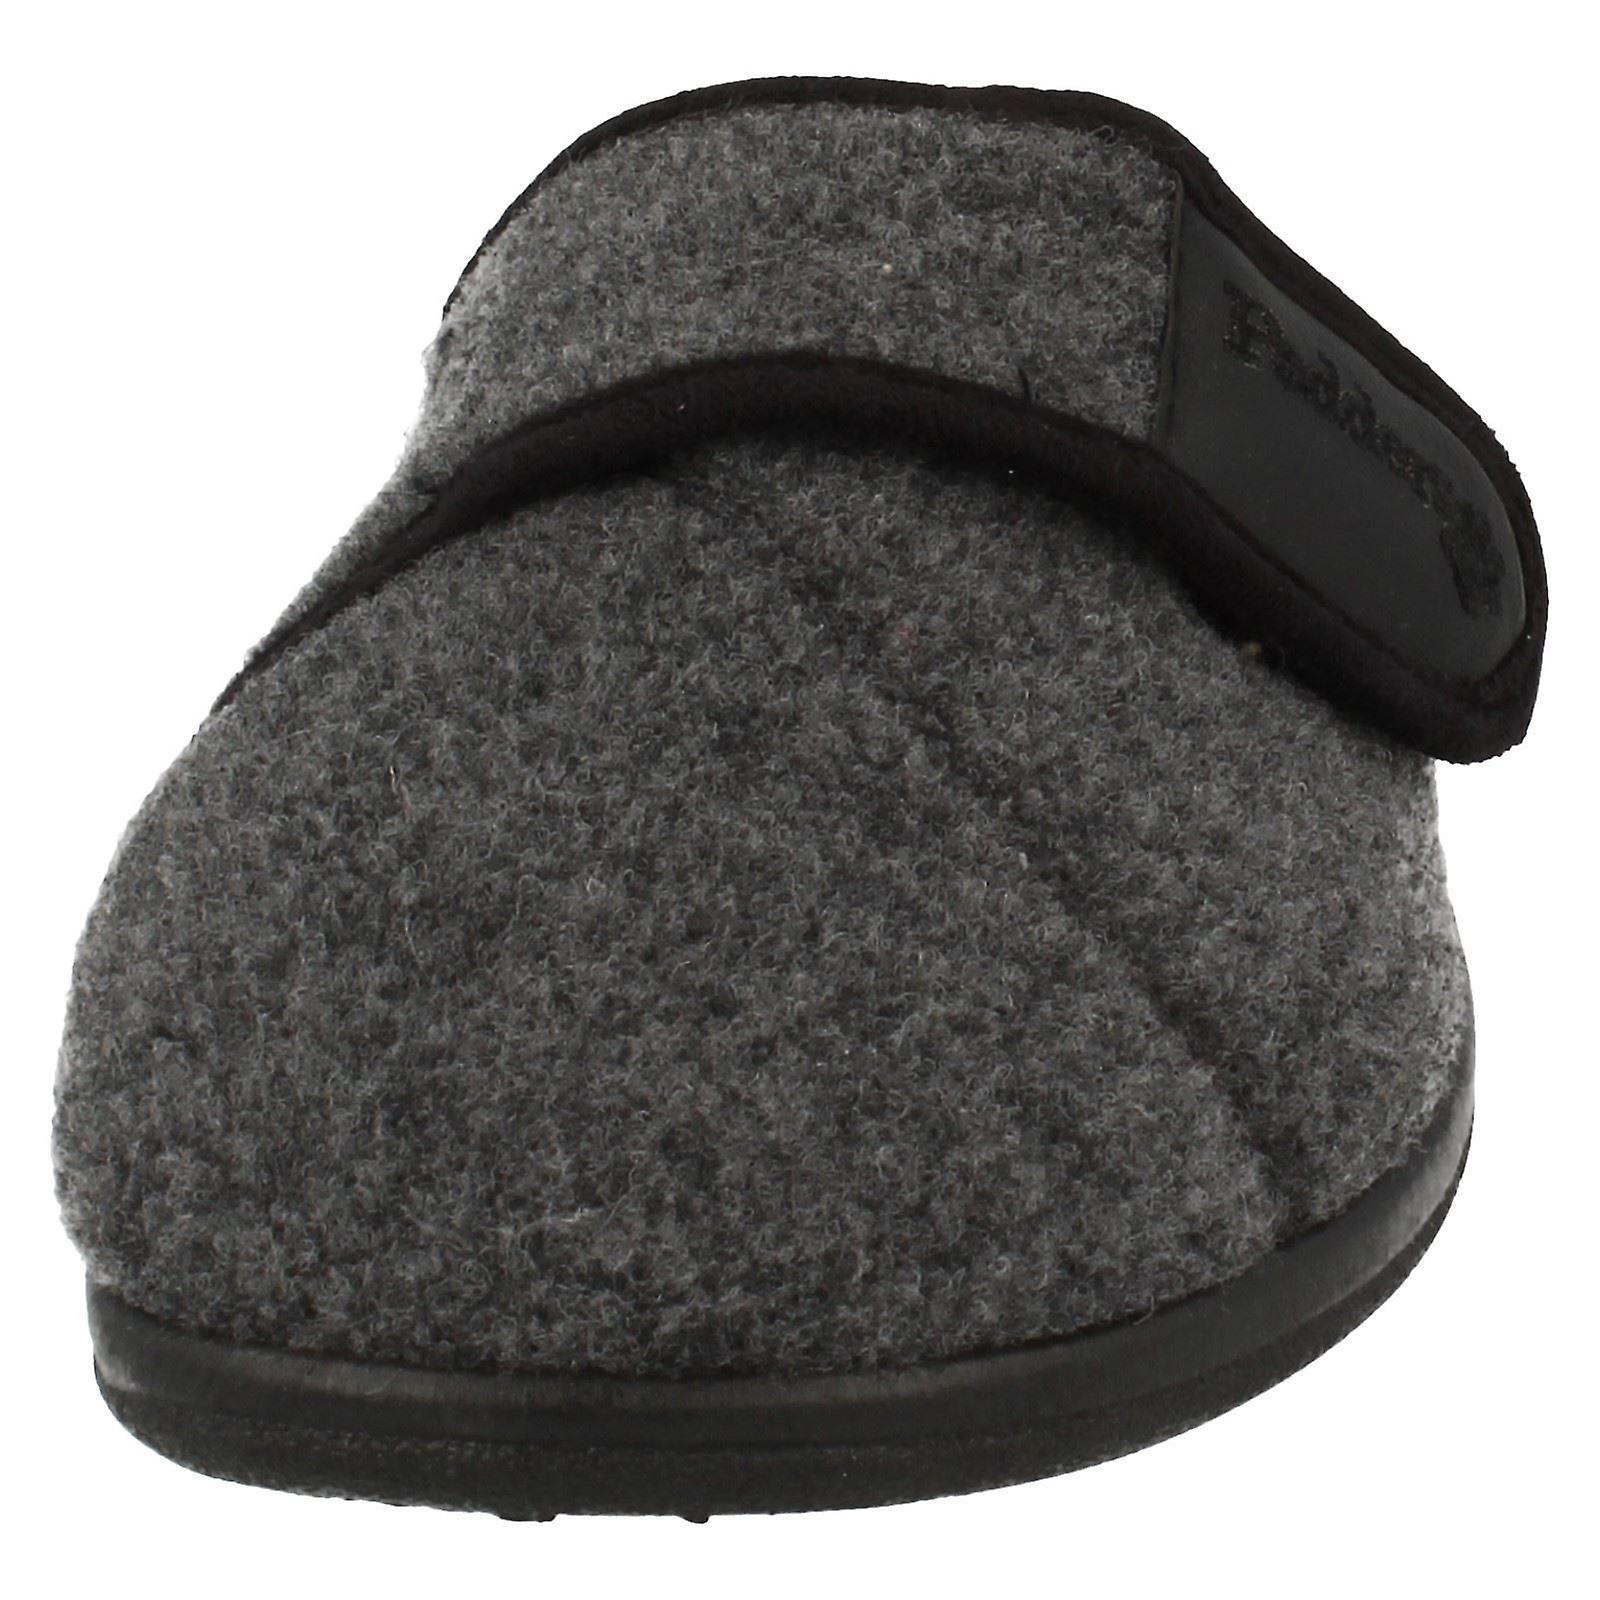 Mens foulard a memoria schiuma mulo pantofole Baxter acxc1l